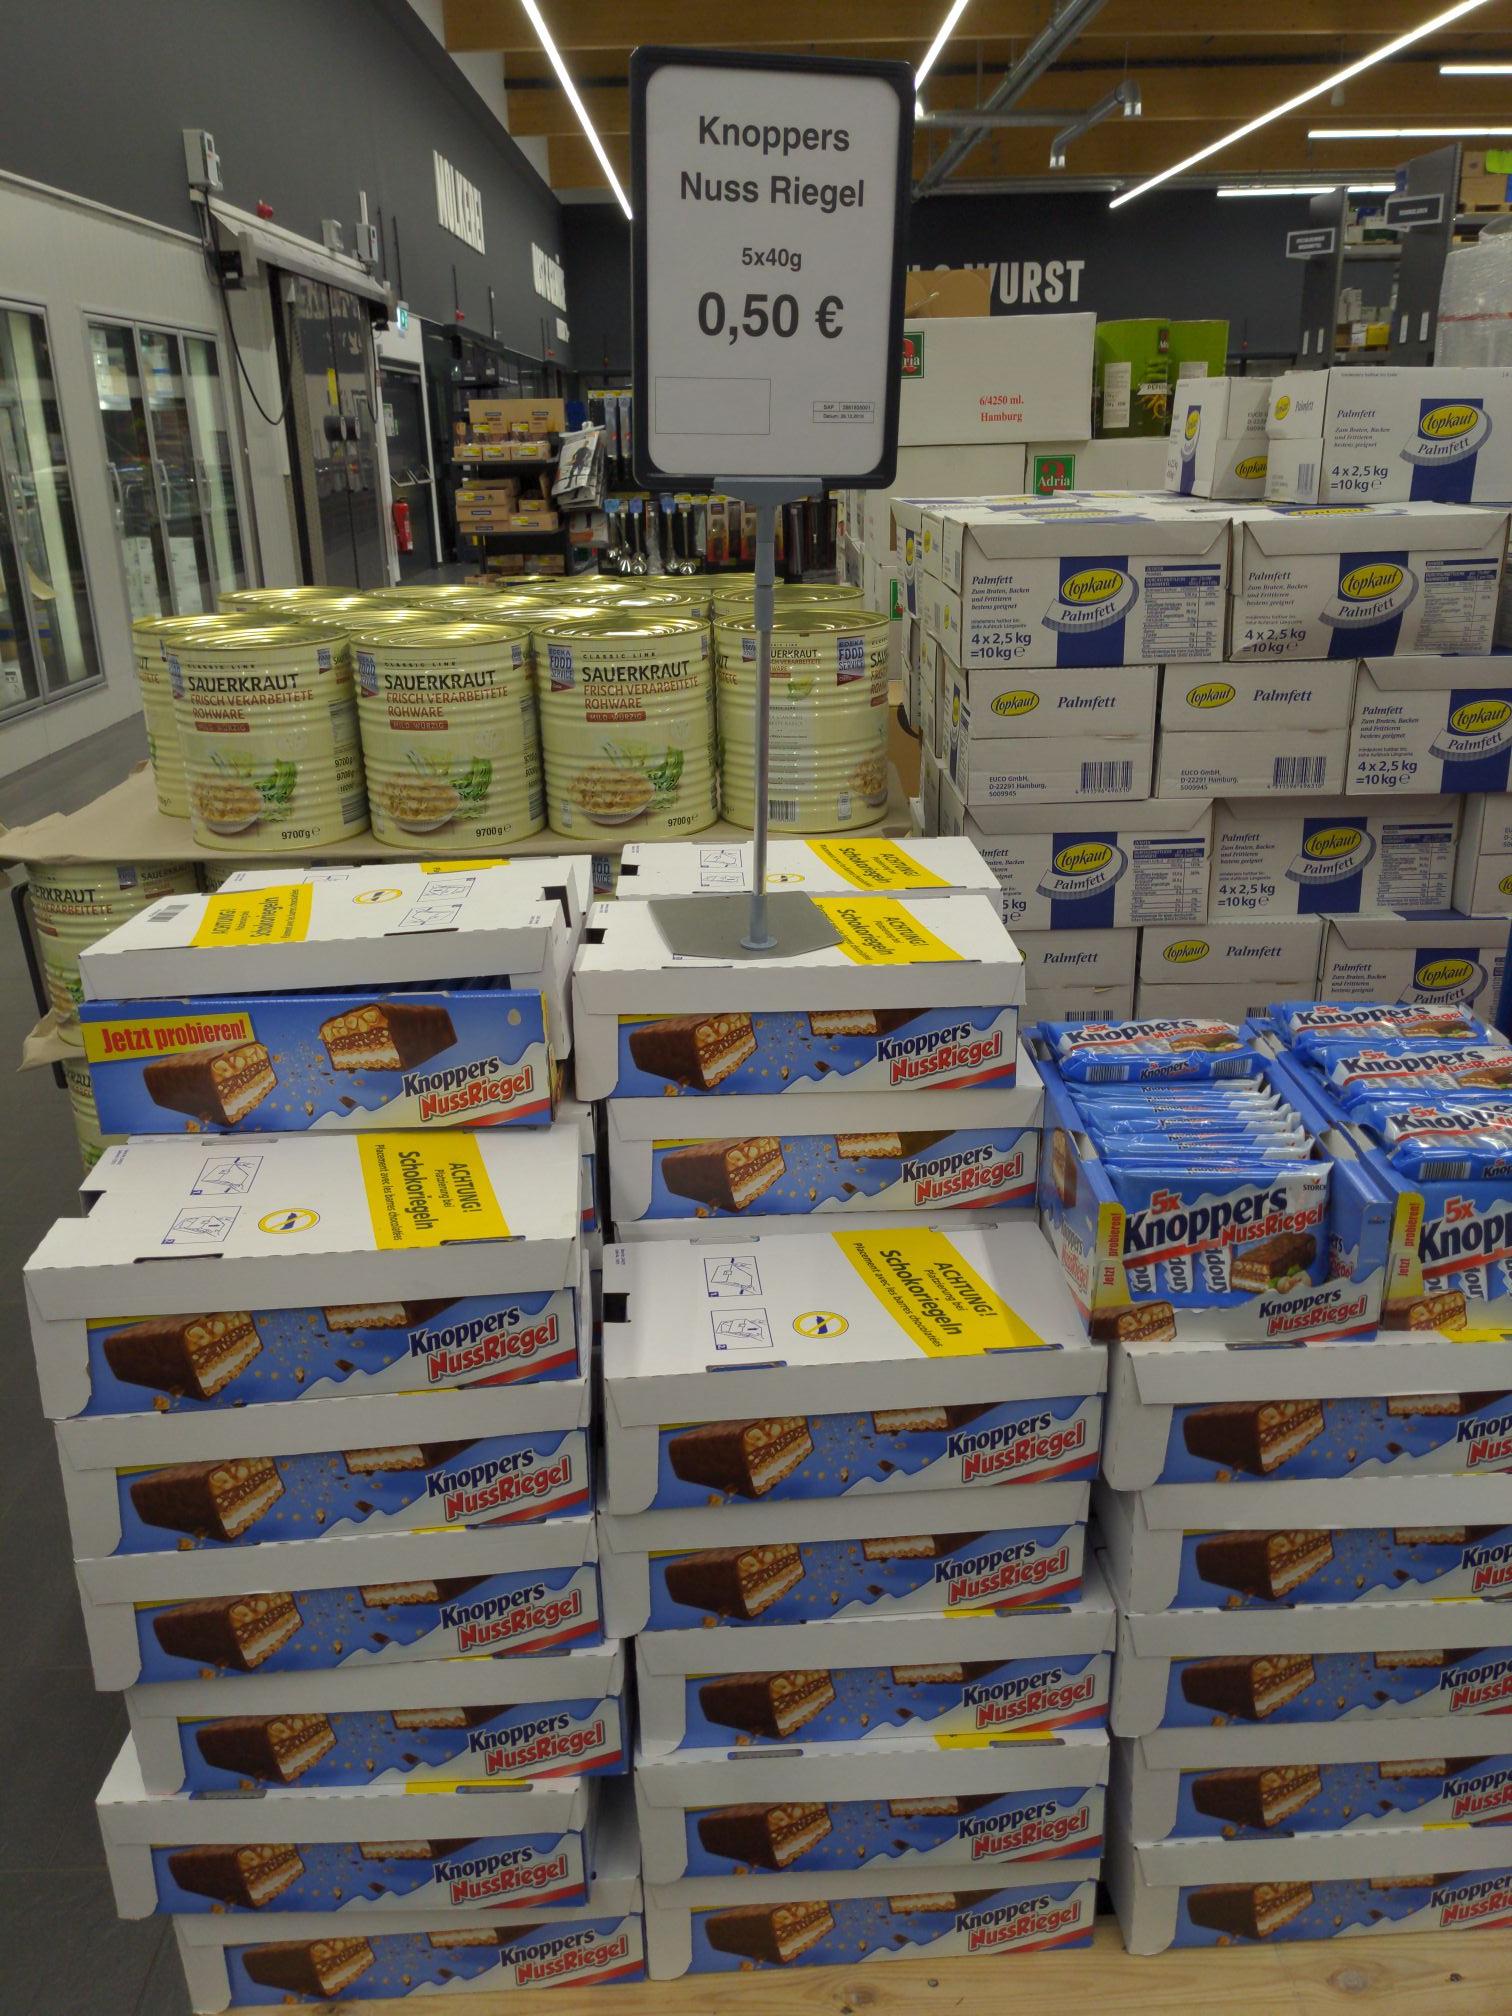 [Lokal Edeka C&C Großhandel Augsburg] Knoppers Riegel 5er Packung (MHD 13.01.20)